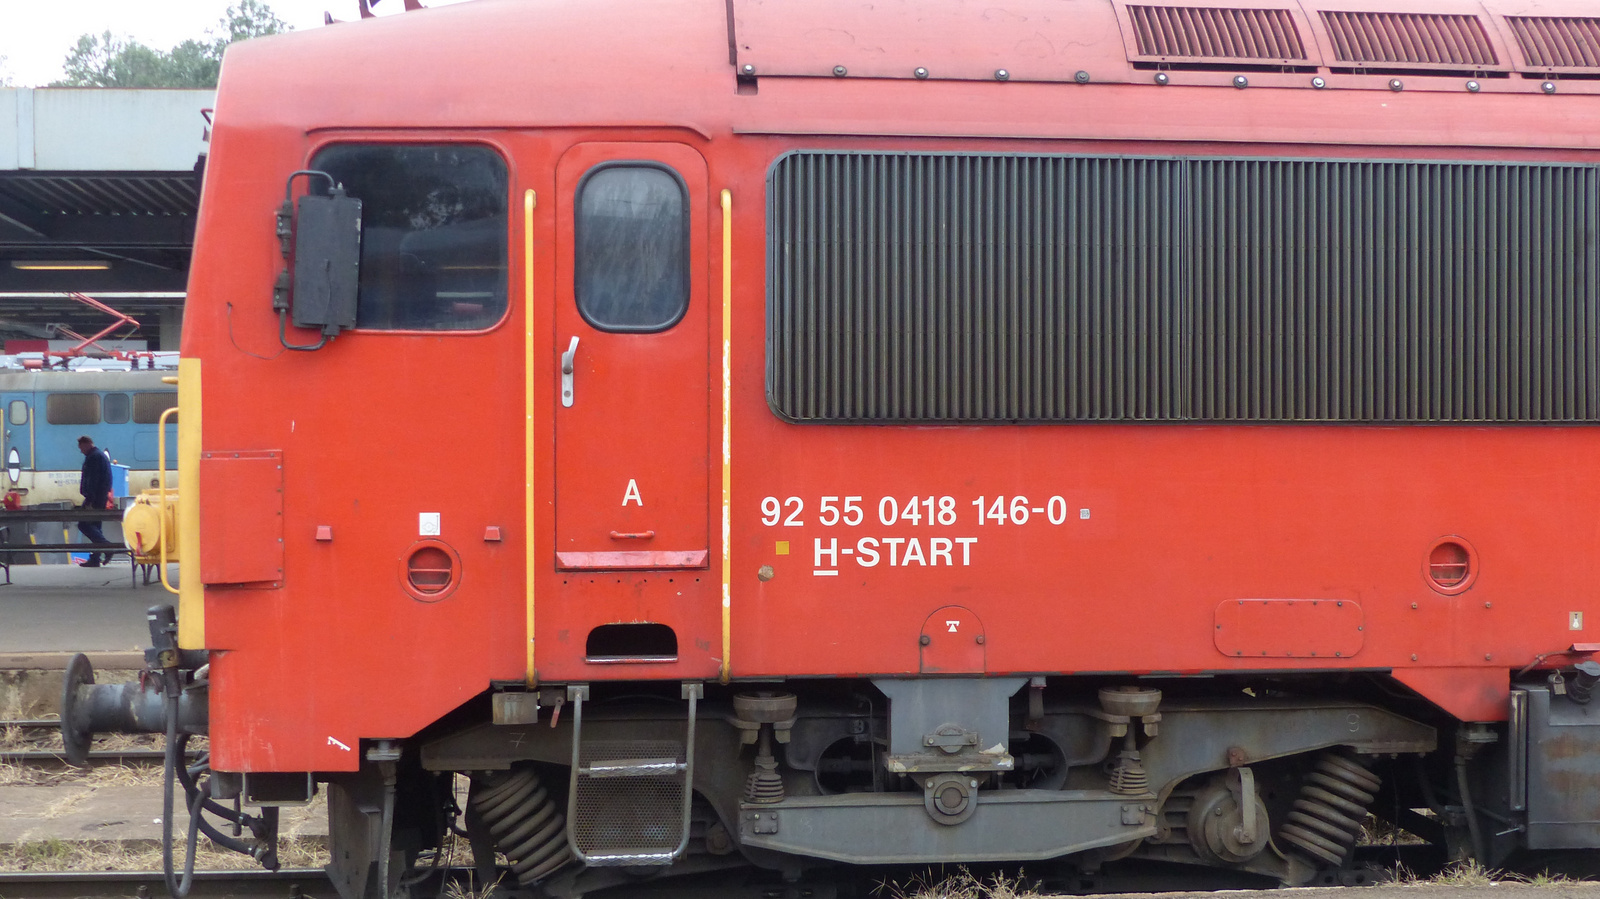 H-START 92 55 0418 146-0, SzG3